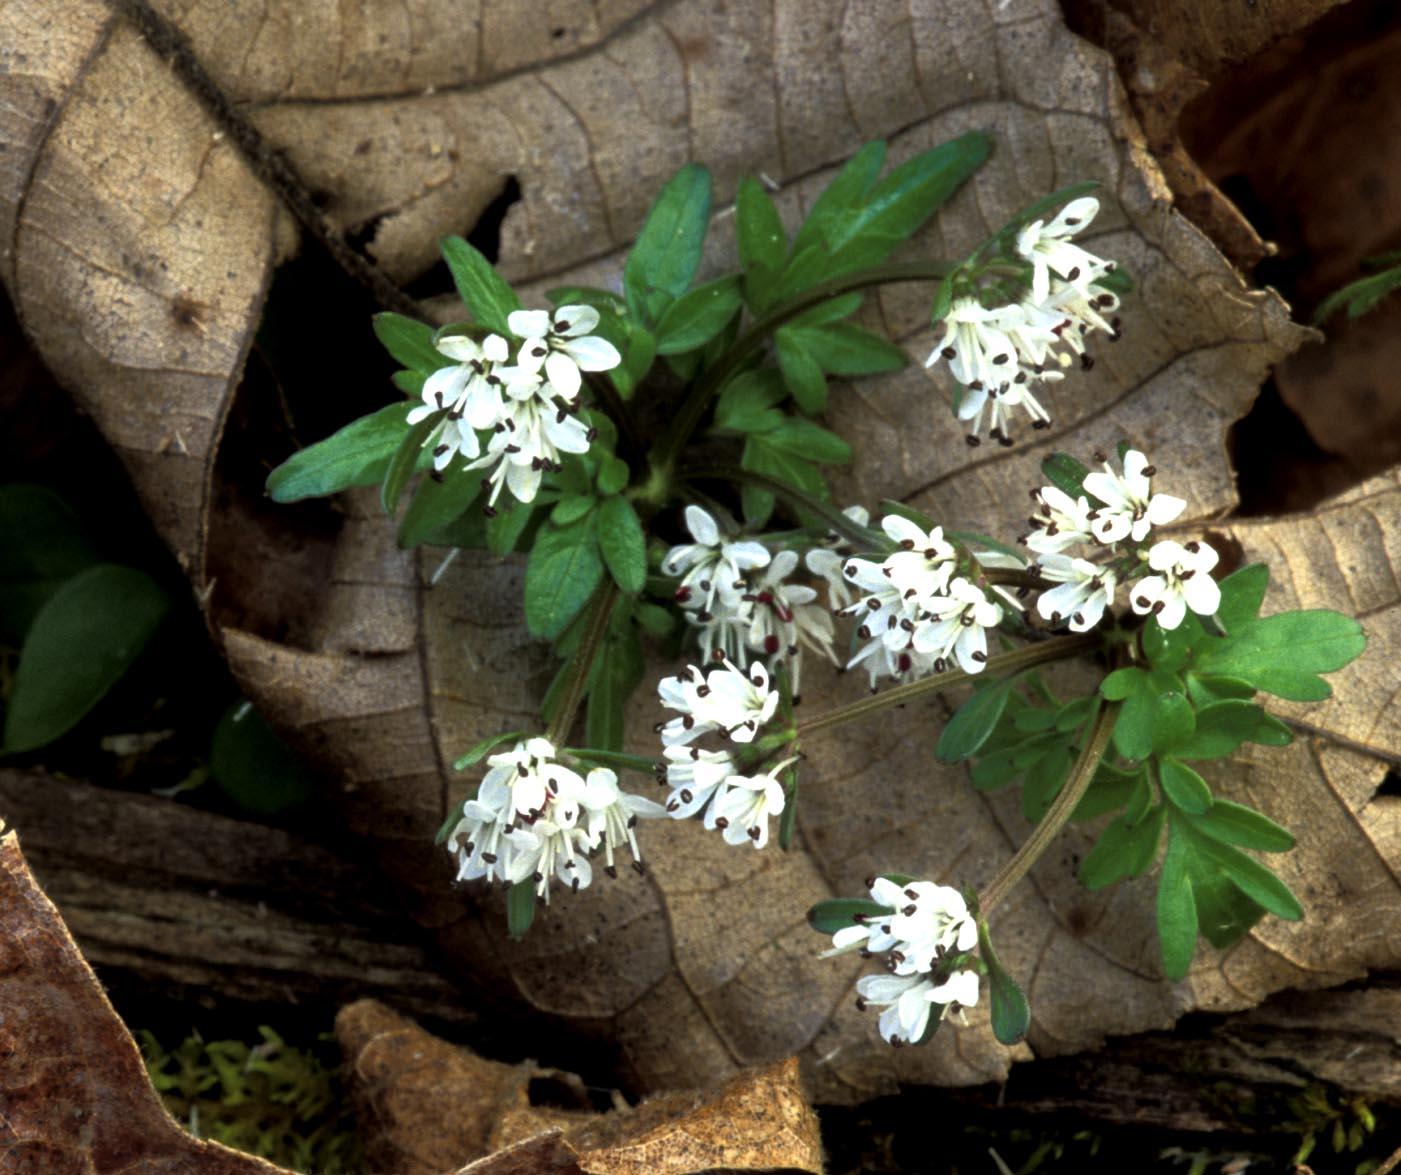 Kentucky Native Plant and Wildlife: February 2013